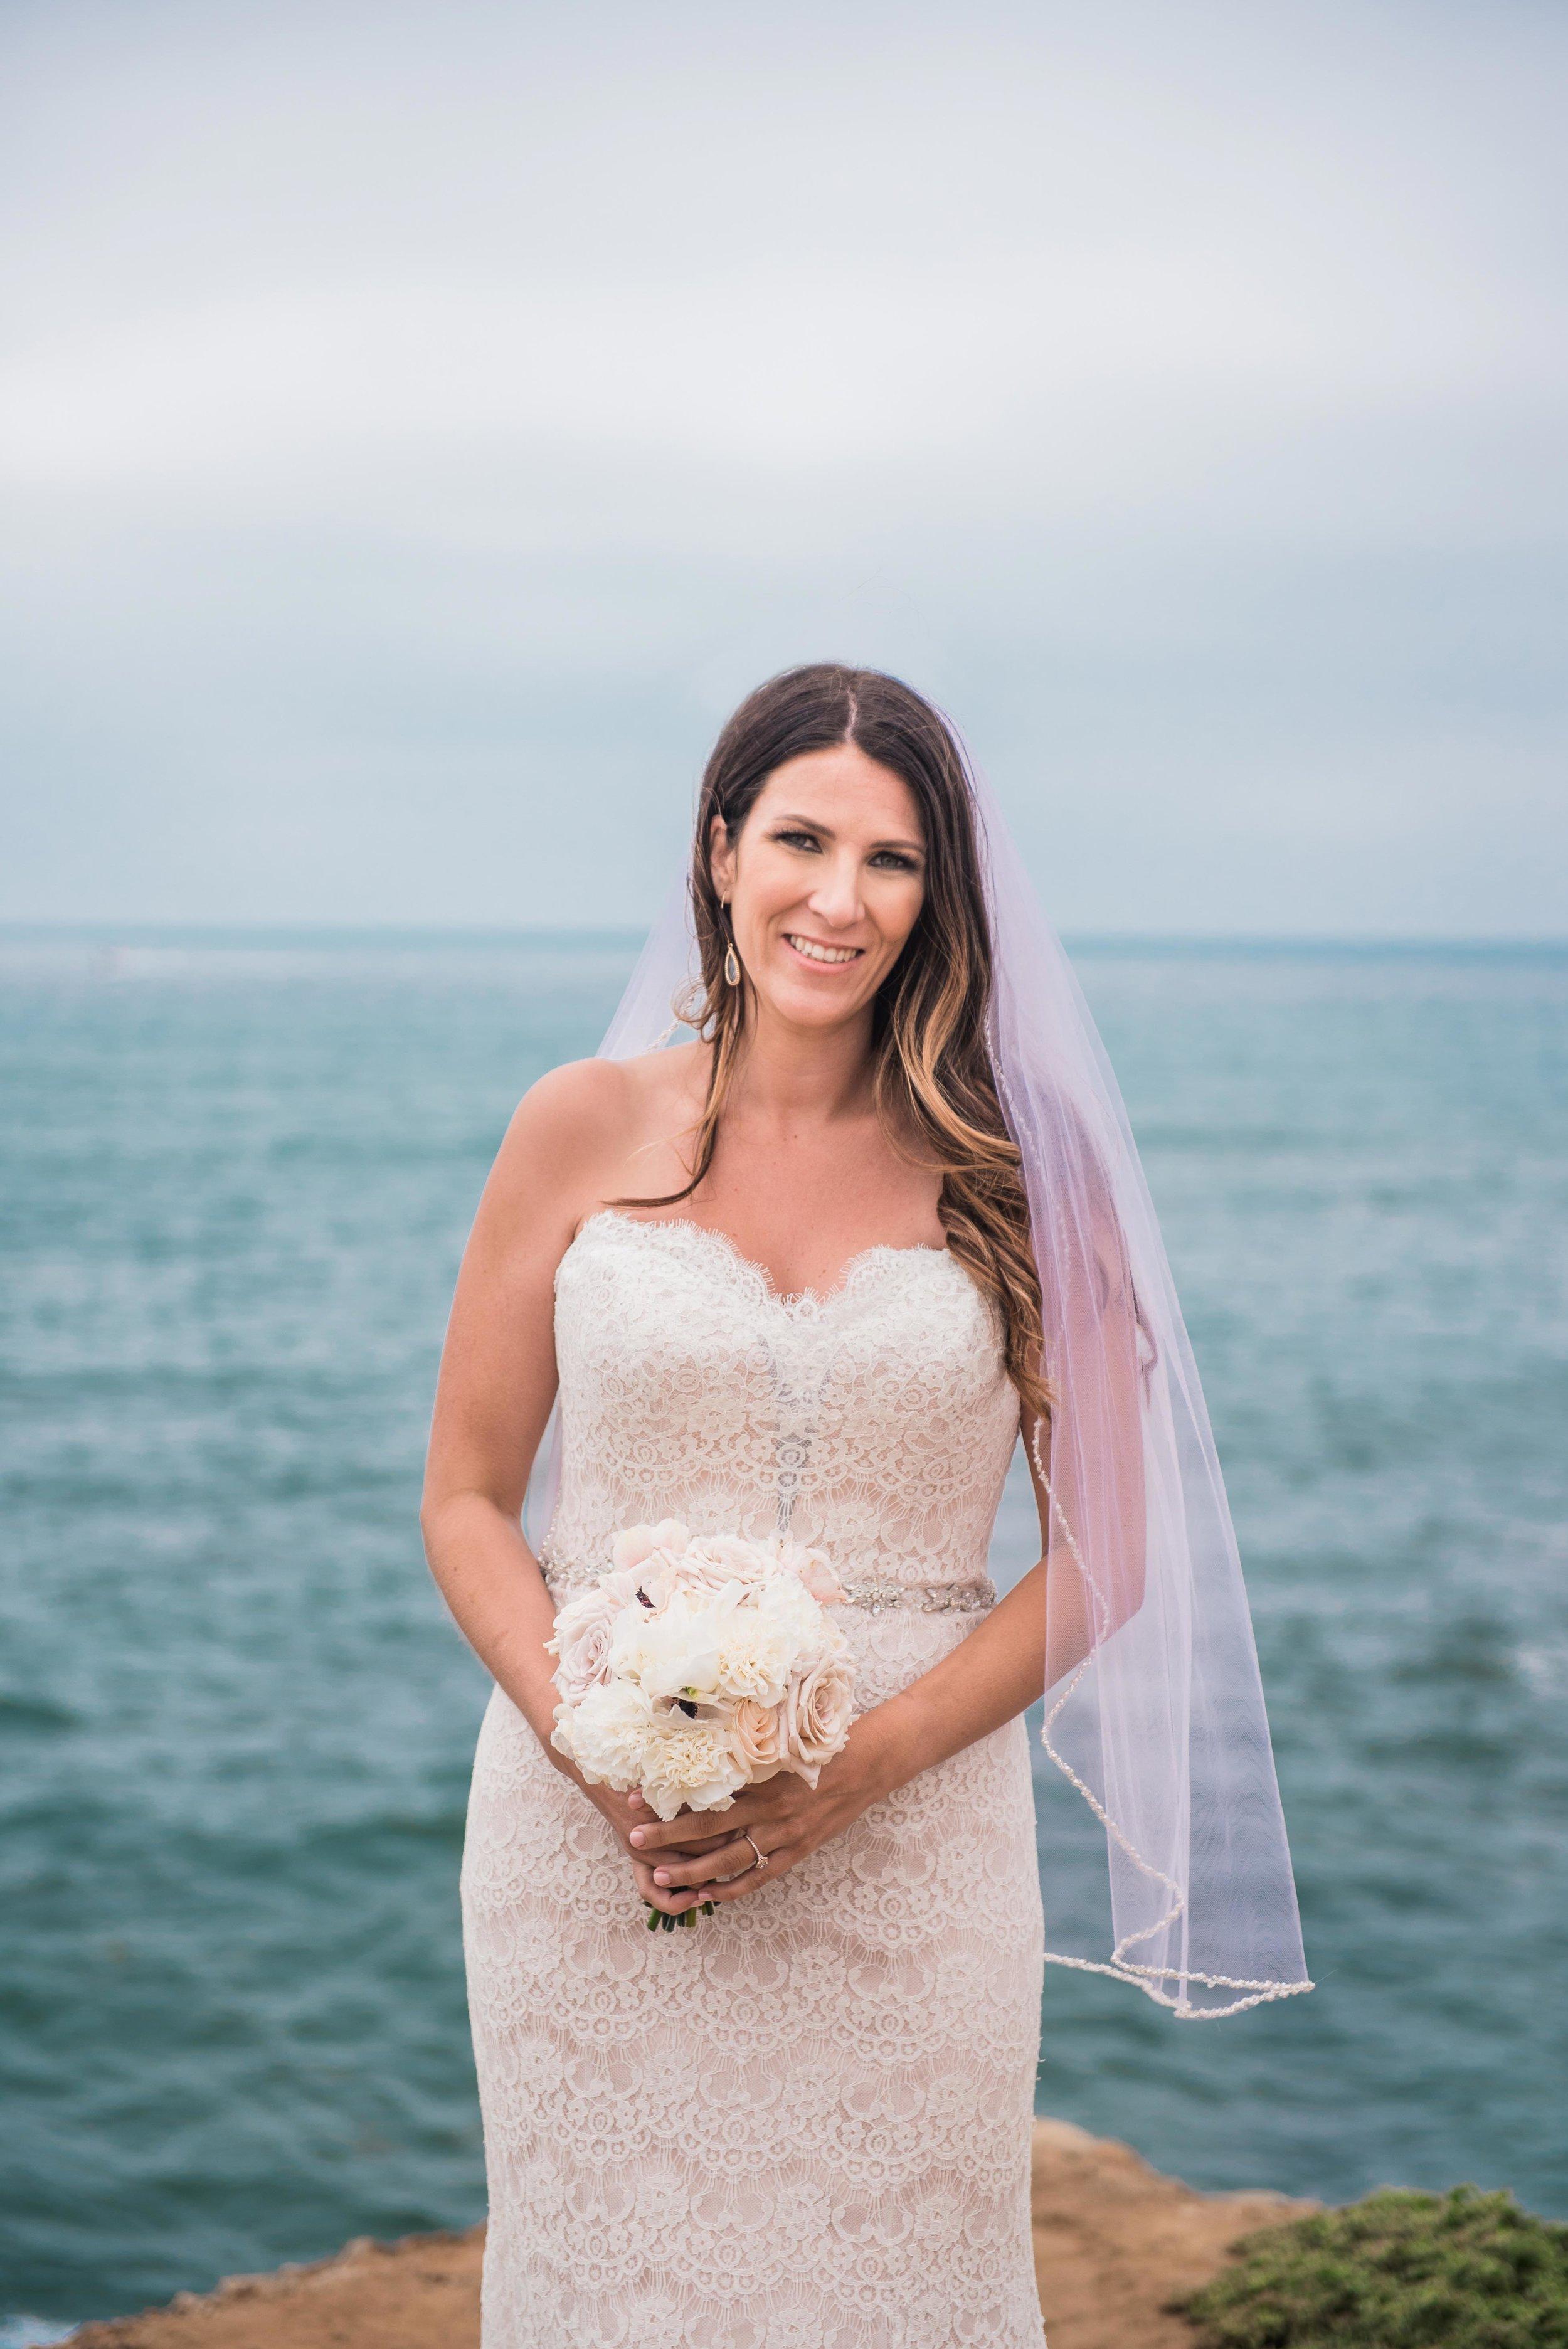 weddingwebsitesmallerpics-315.jpg